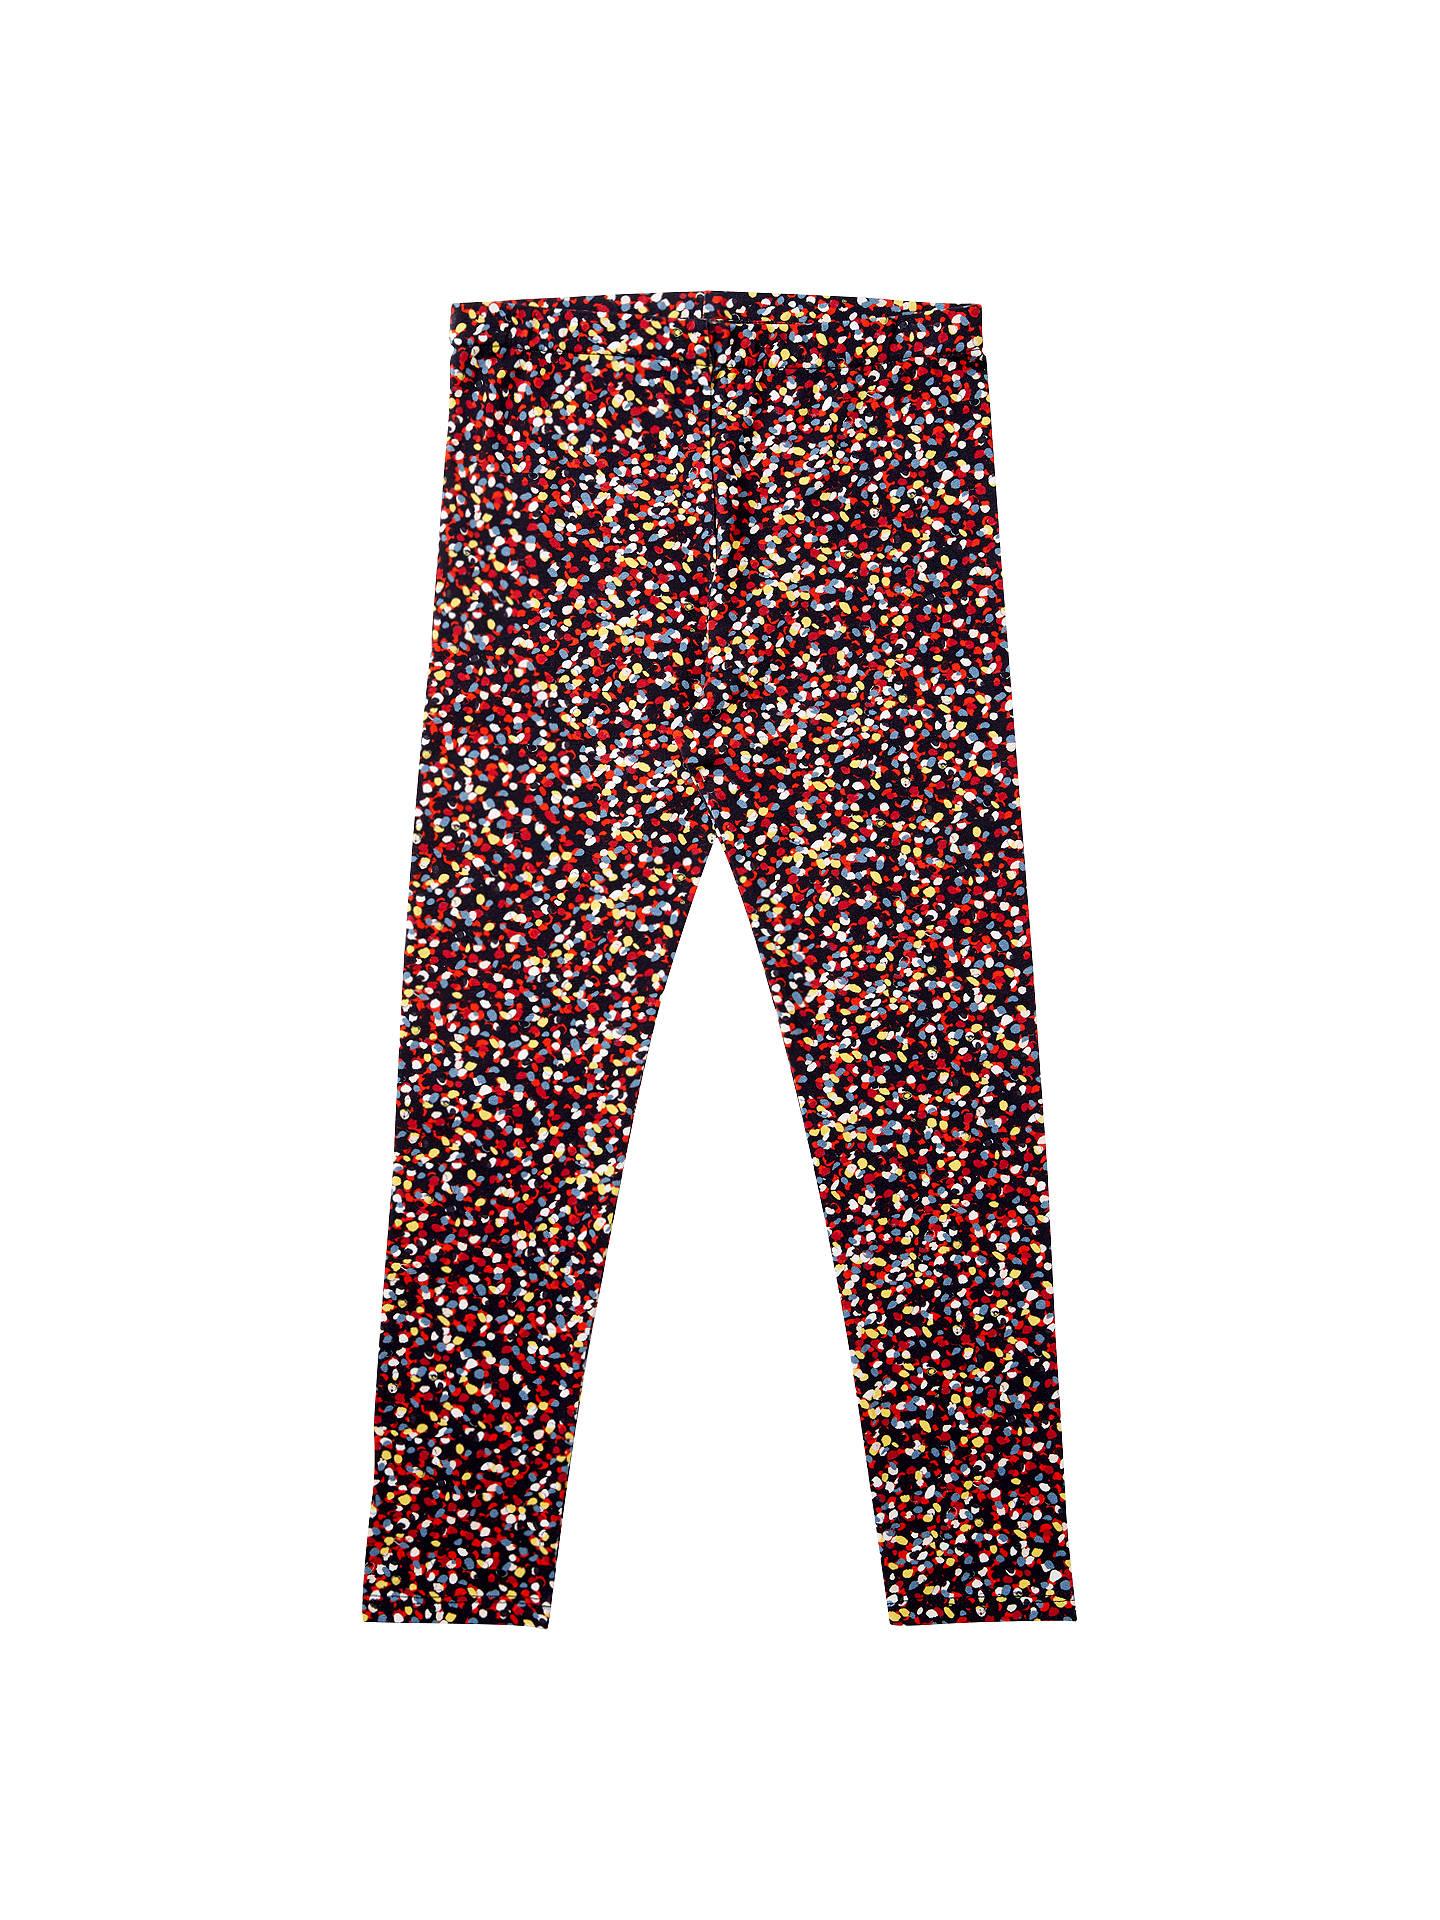 Jigsaw Confetti Print Leggings Girls New Blue Navy